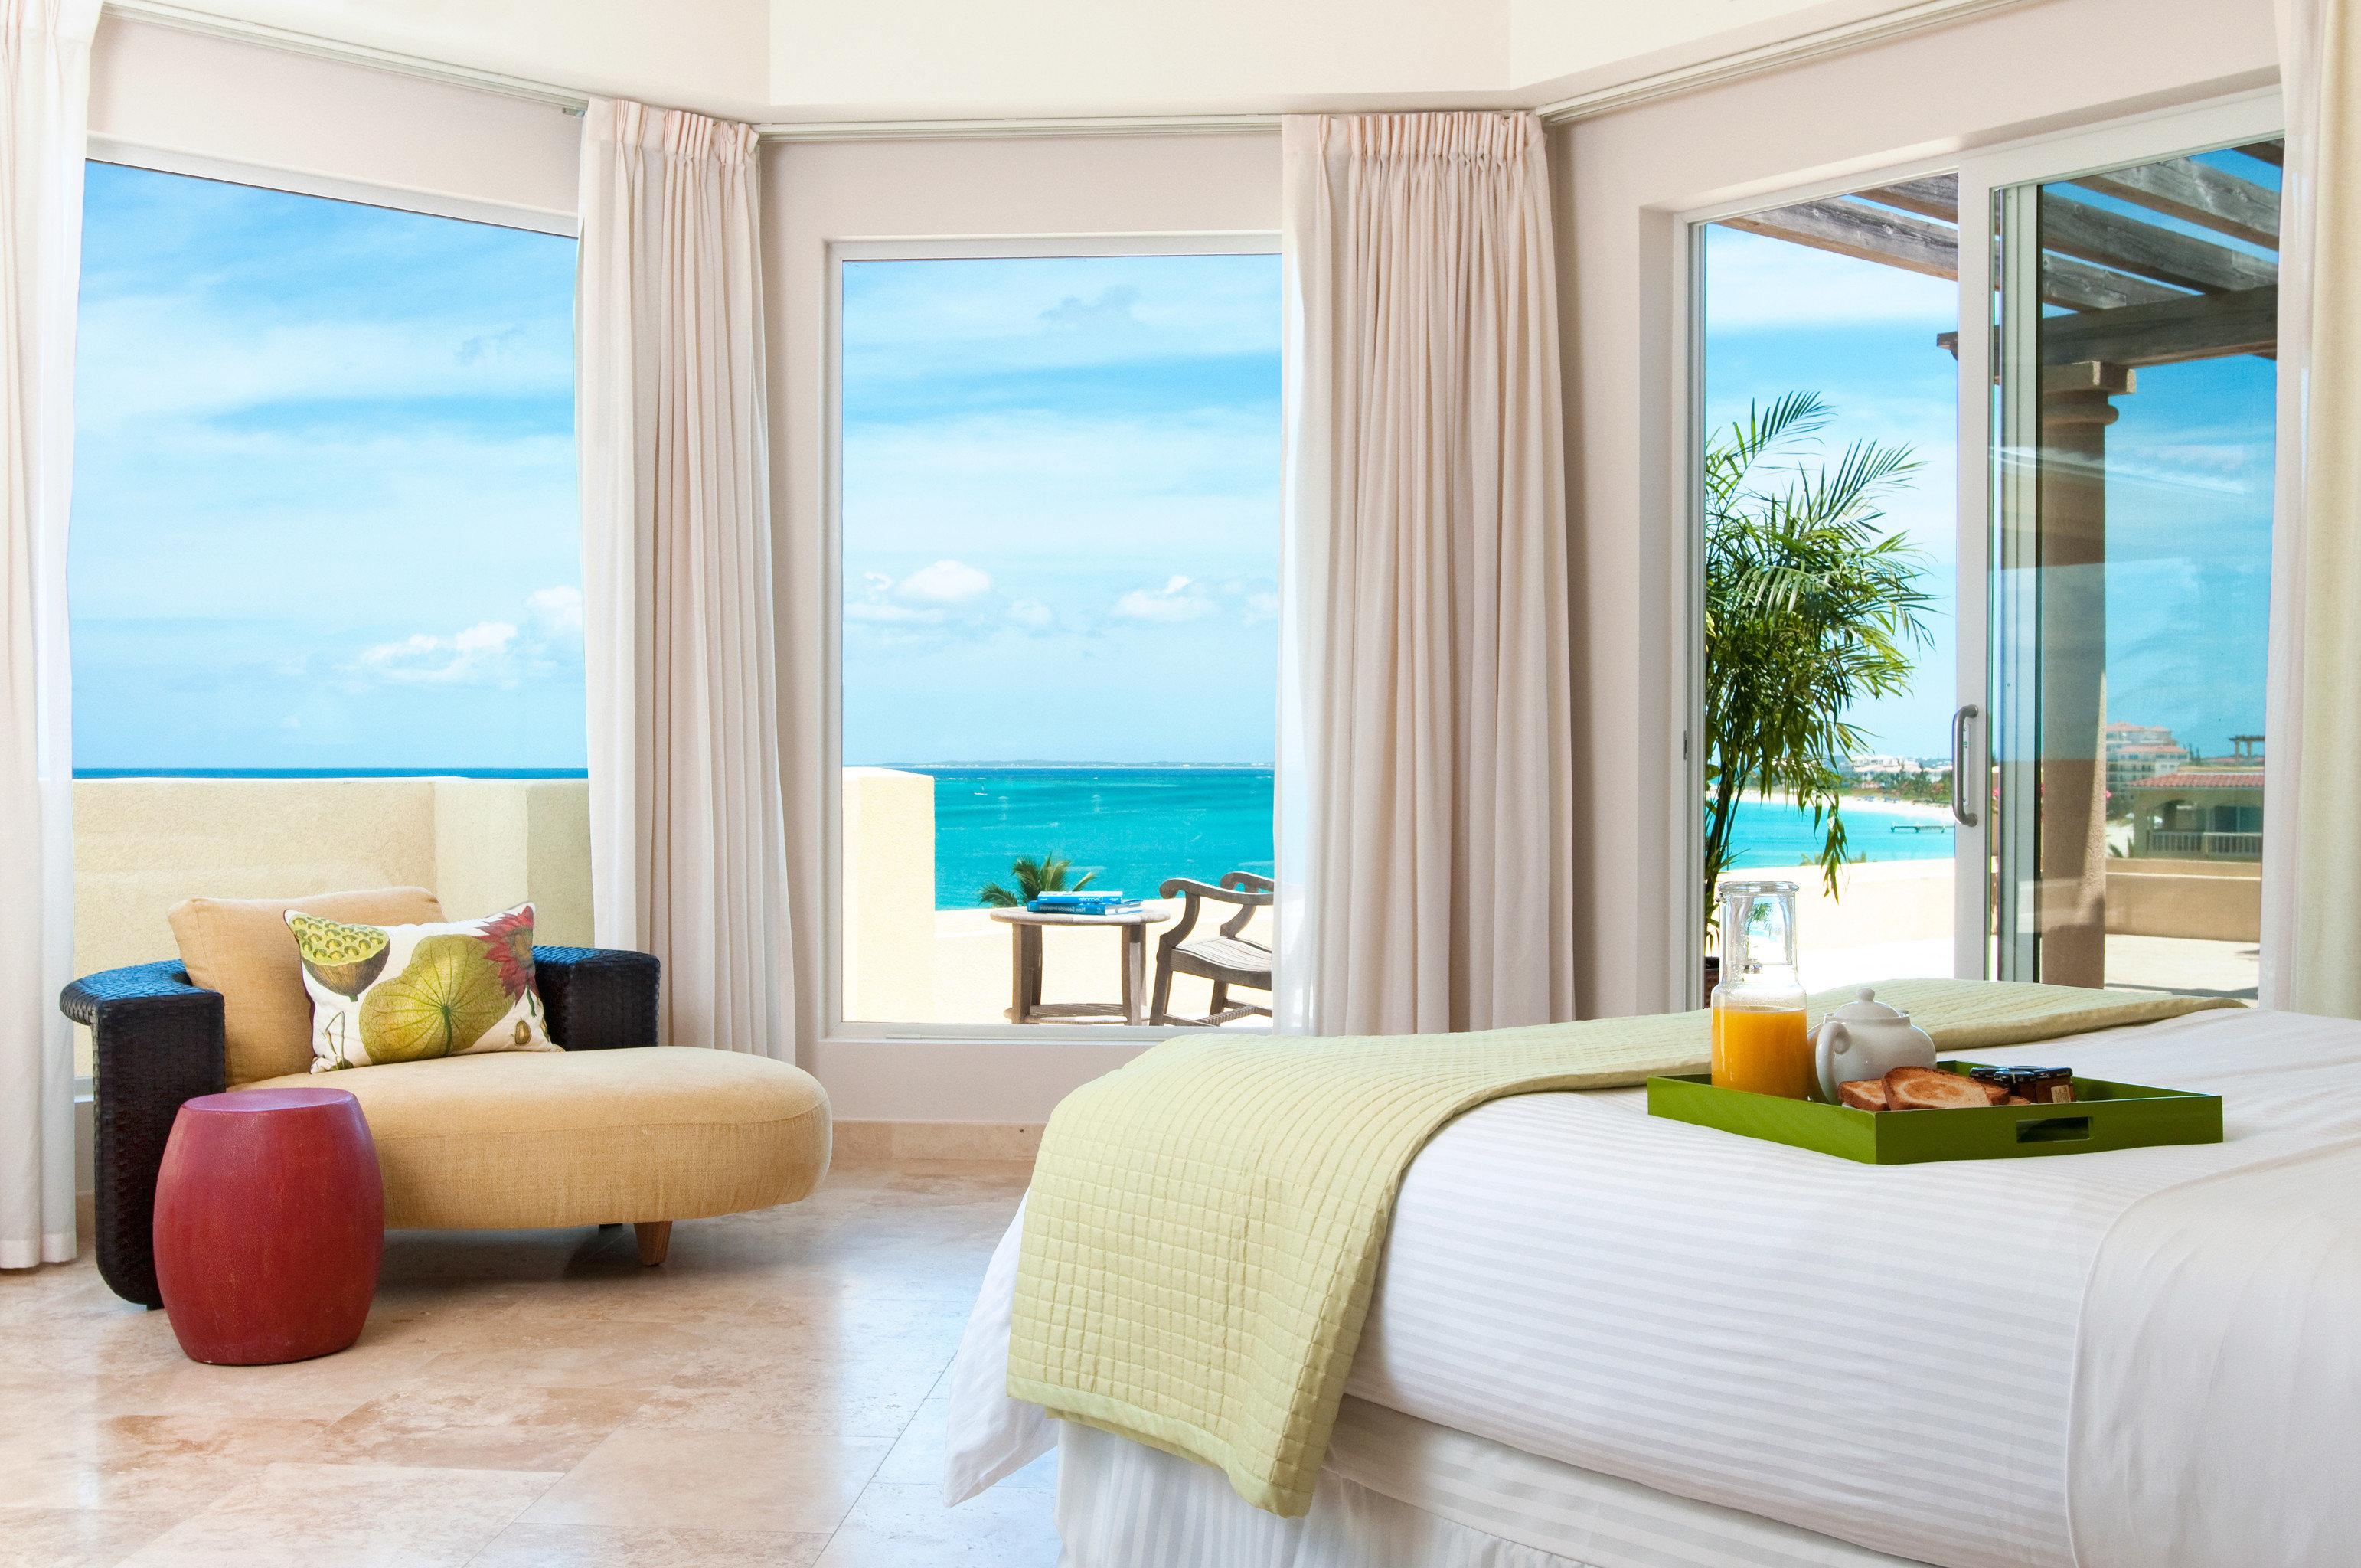 Beachfront Hotels Luxury Romance Scenic views sofa property living room nice condominium home Suite overlooking flat